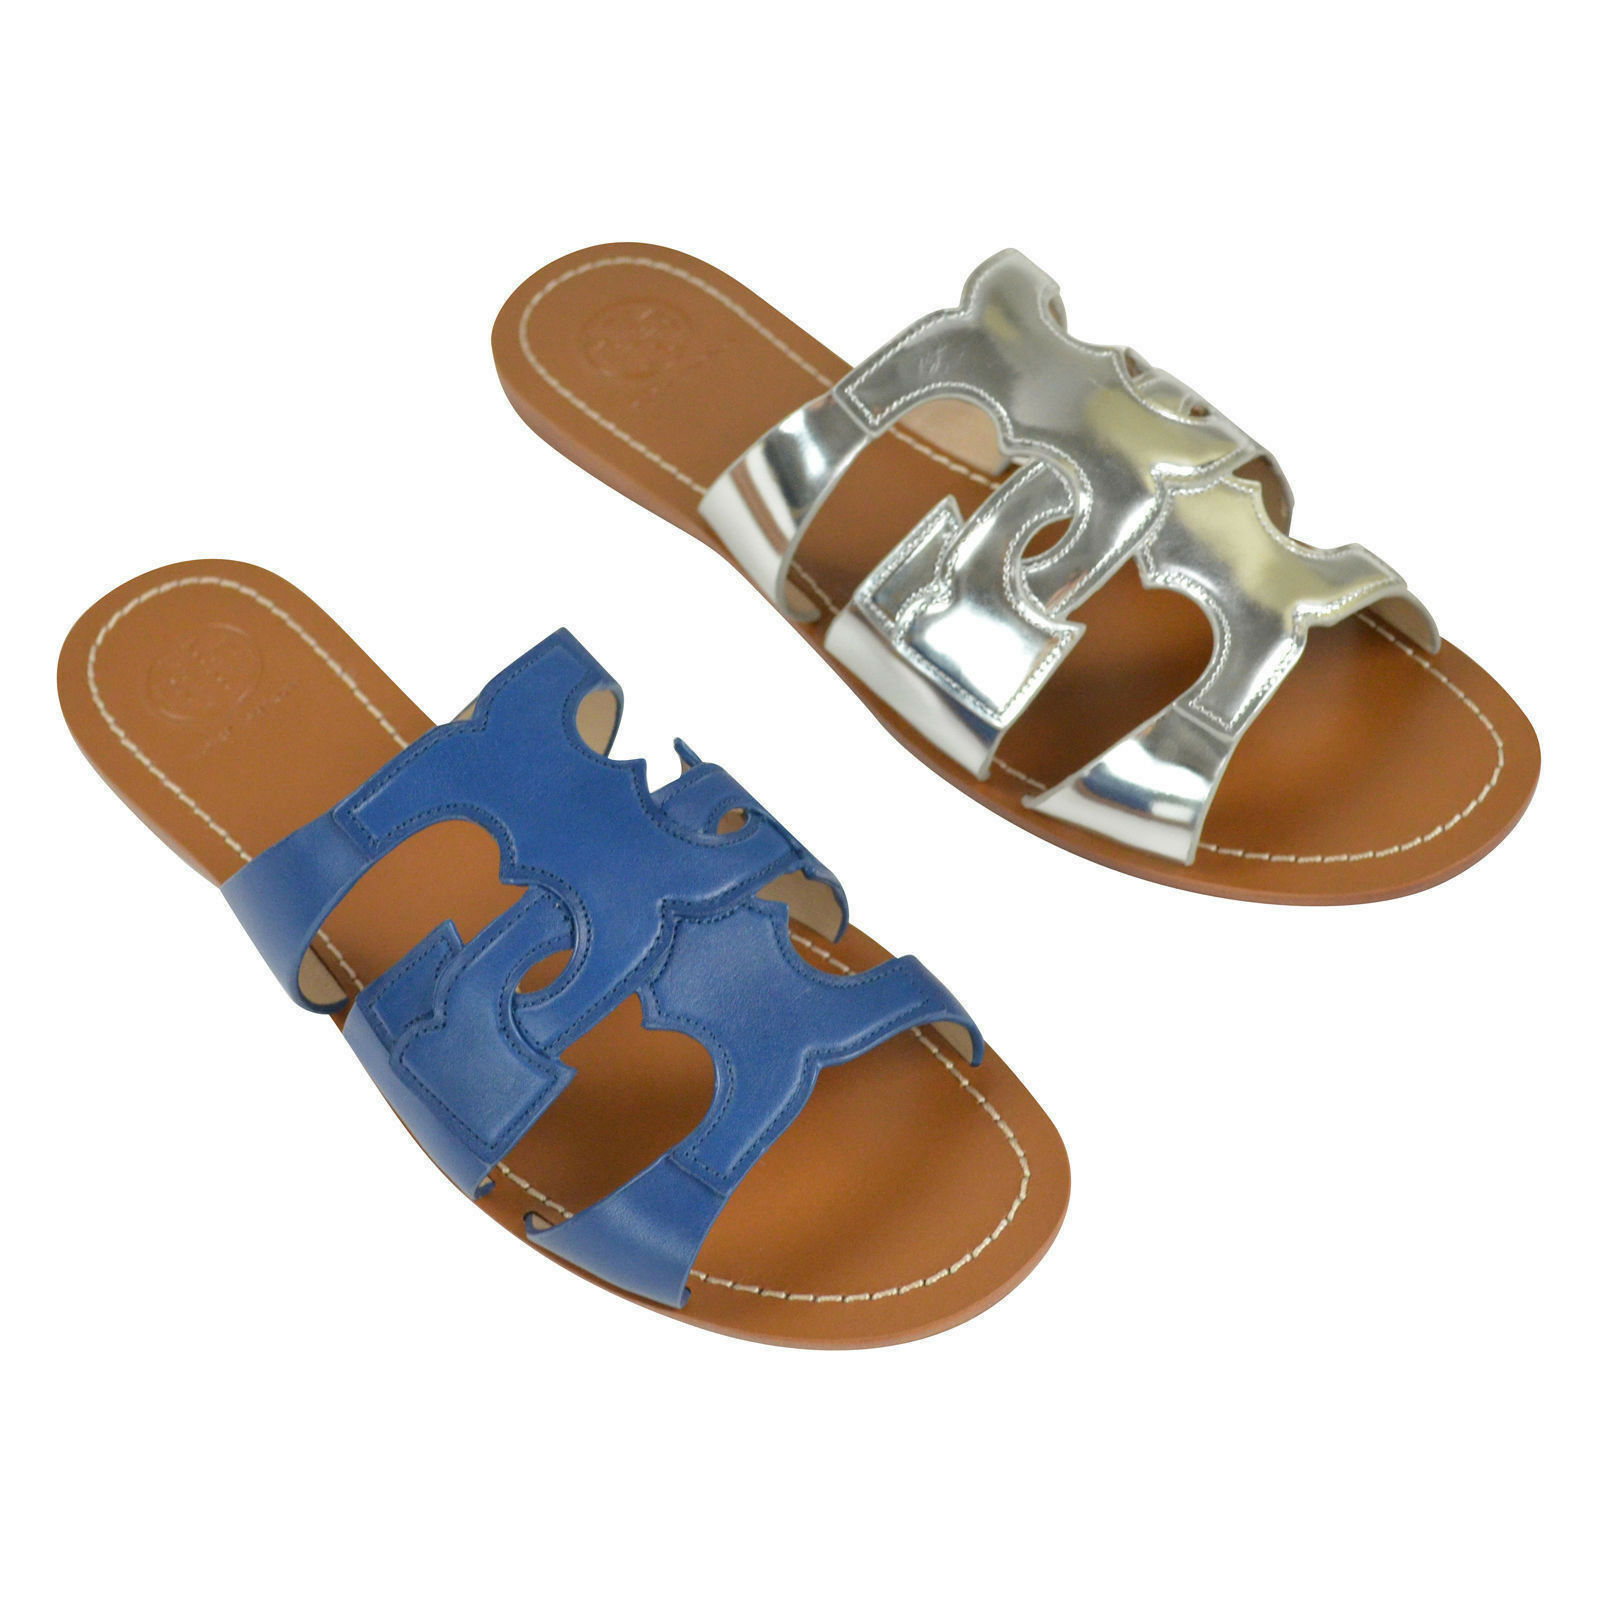 NIB Tory Burch Anchor T Flat Slide Leather Sandals Baltic 8-9